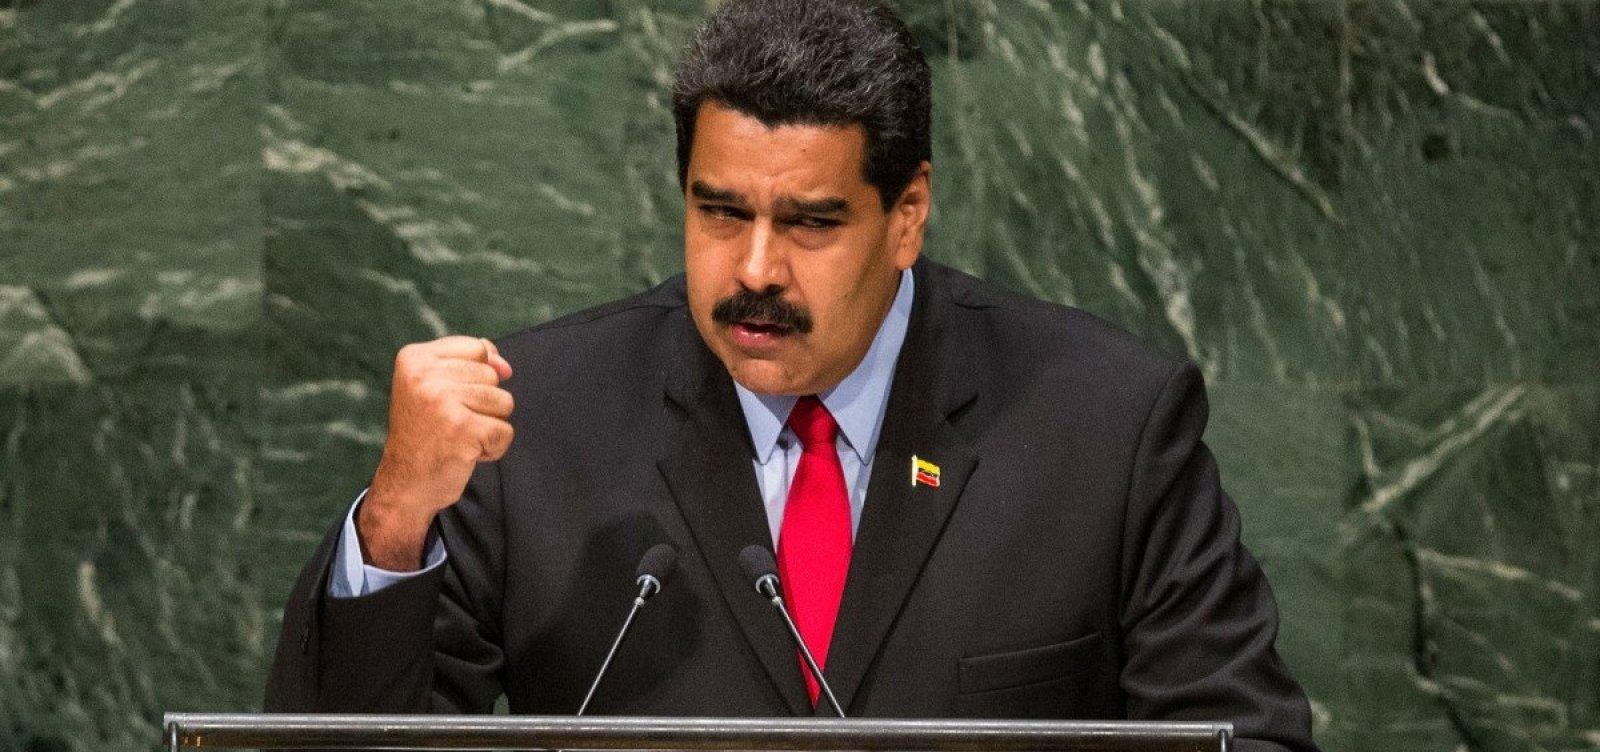 [Seis países denunciam governo Maduro a Tribunal Penal Internacional]